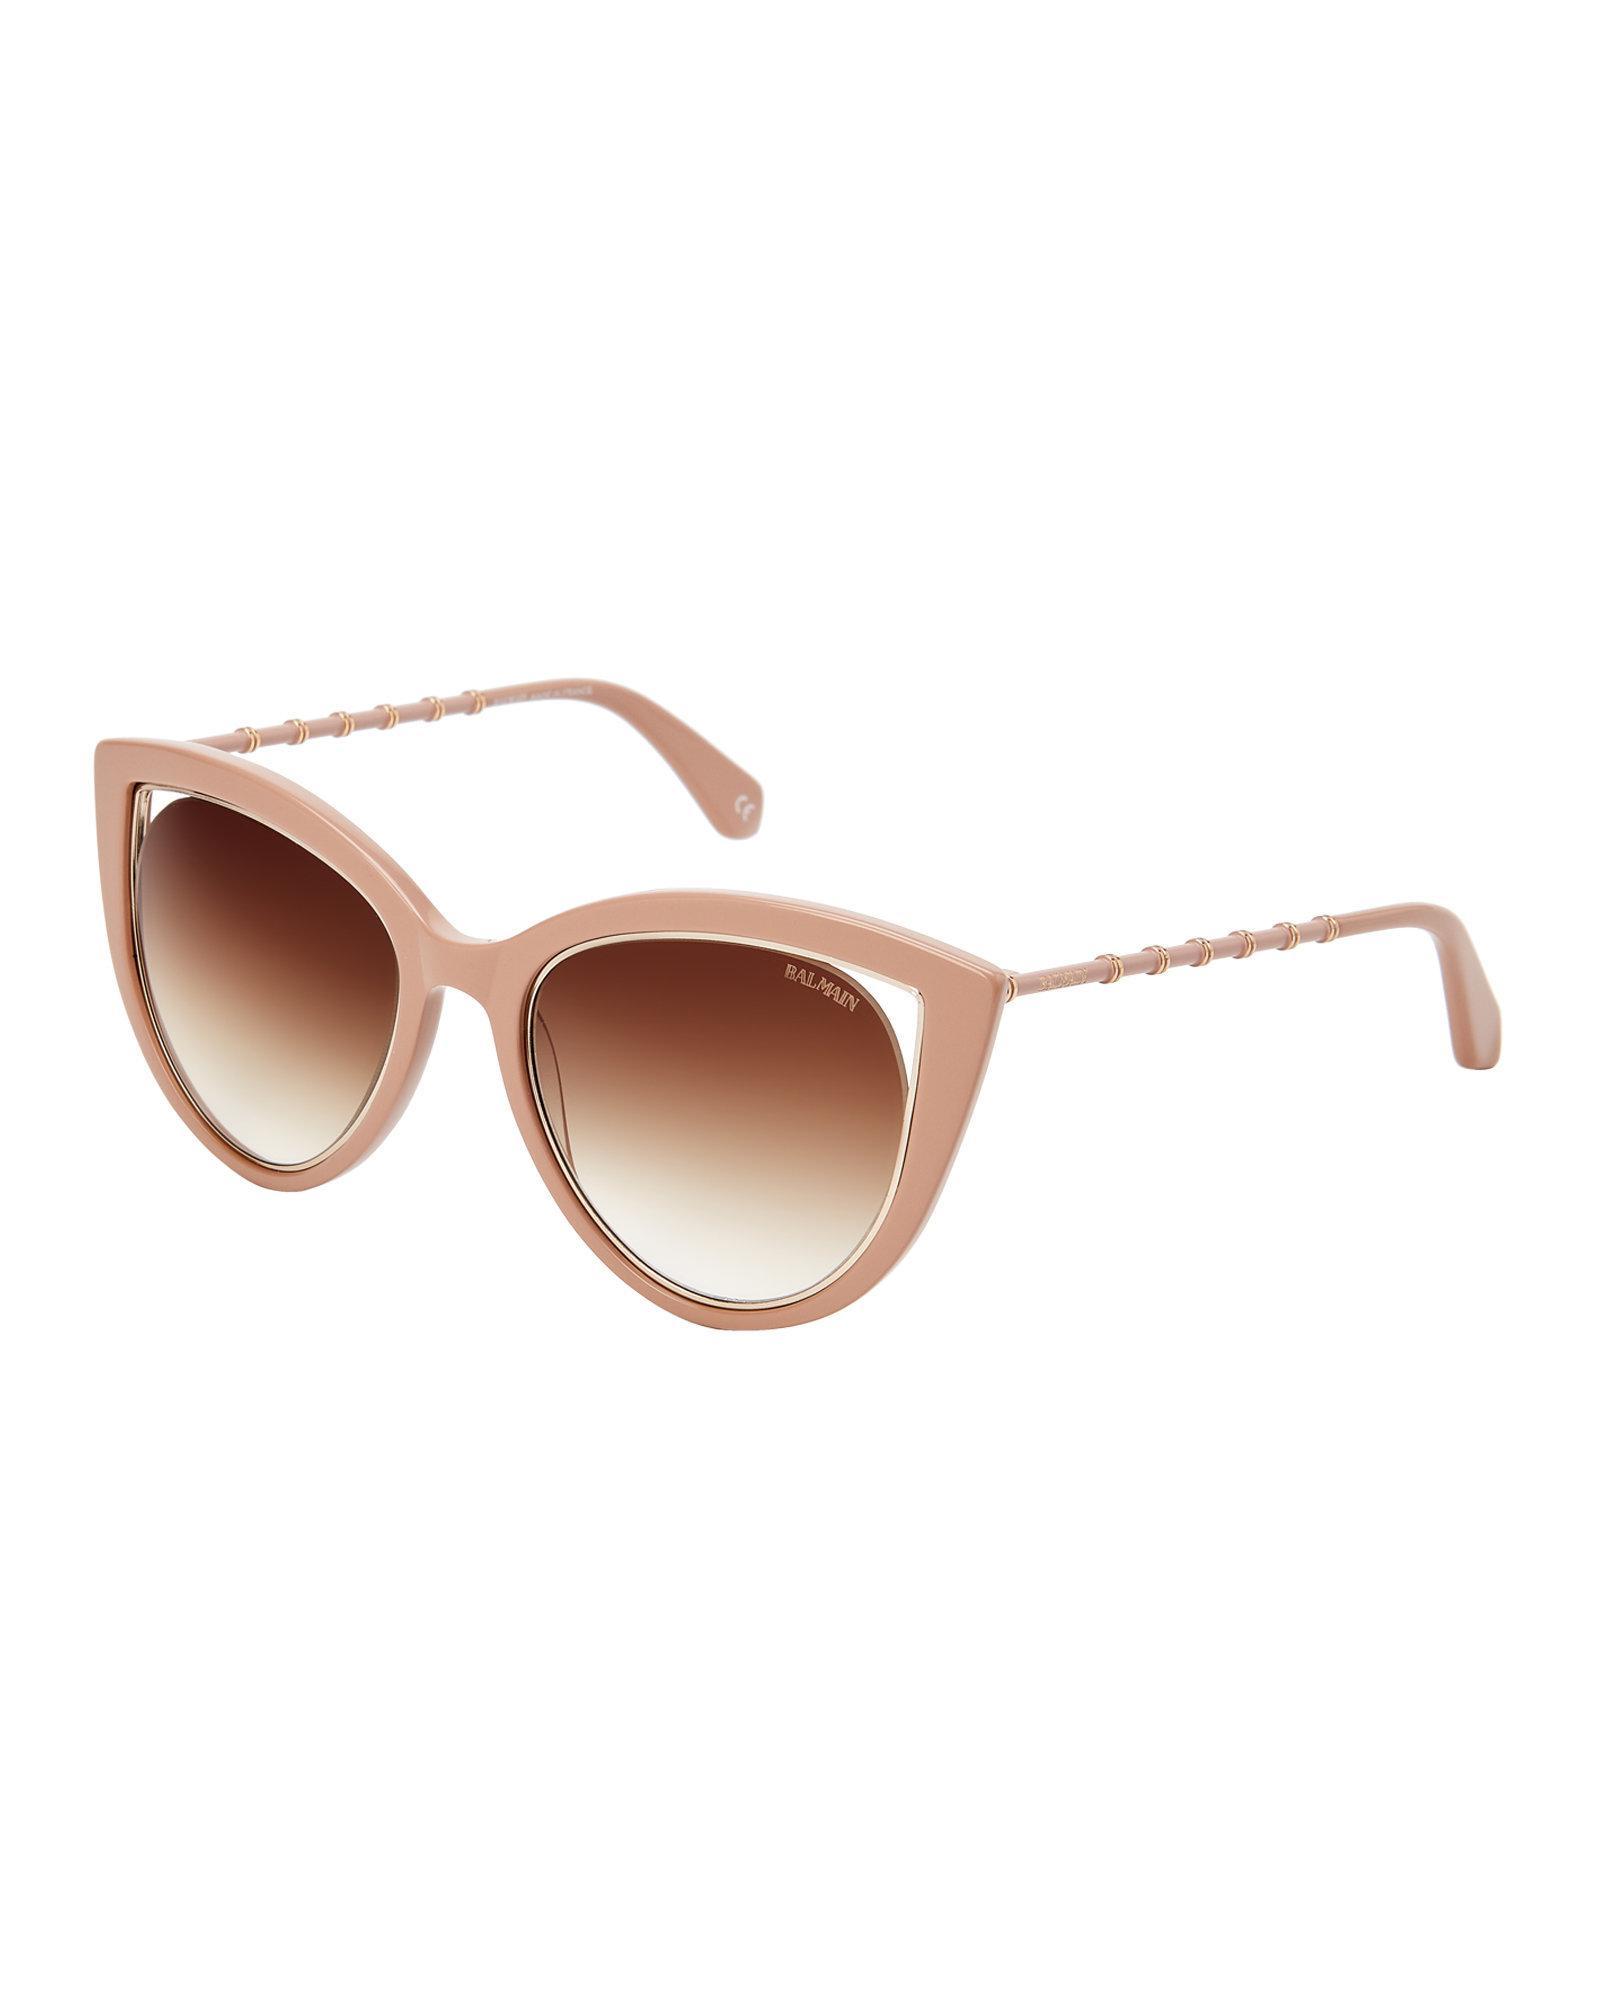 df87b43a346267 Balmain Bl2517 Beige Cat Eye Sunglasses - Lyst